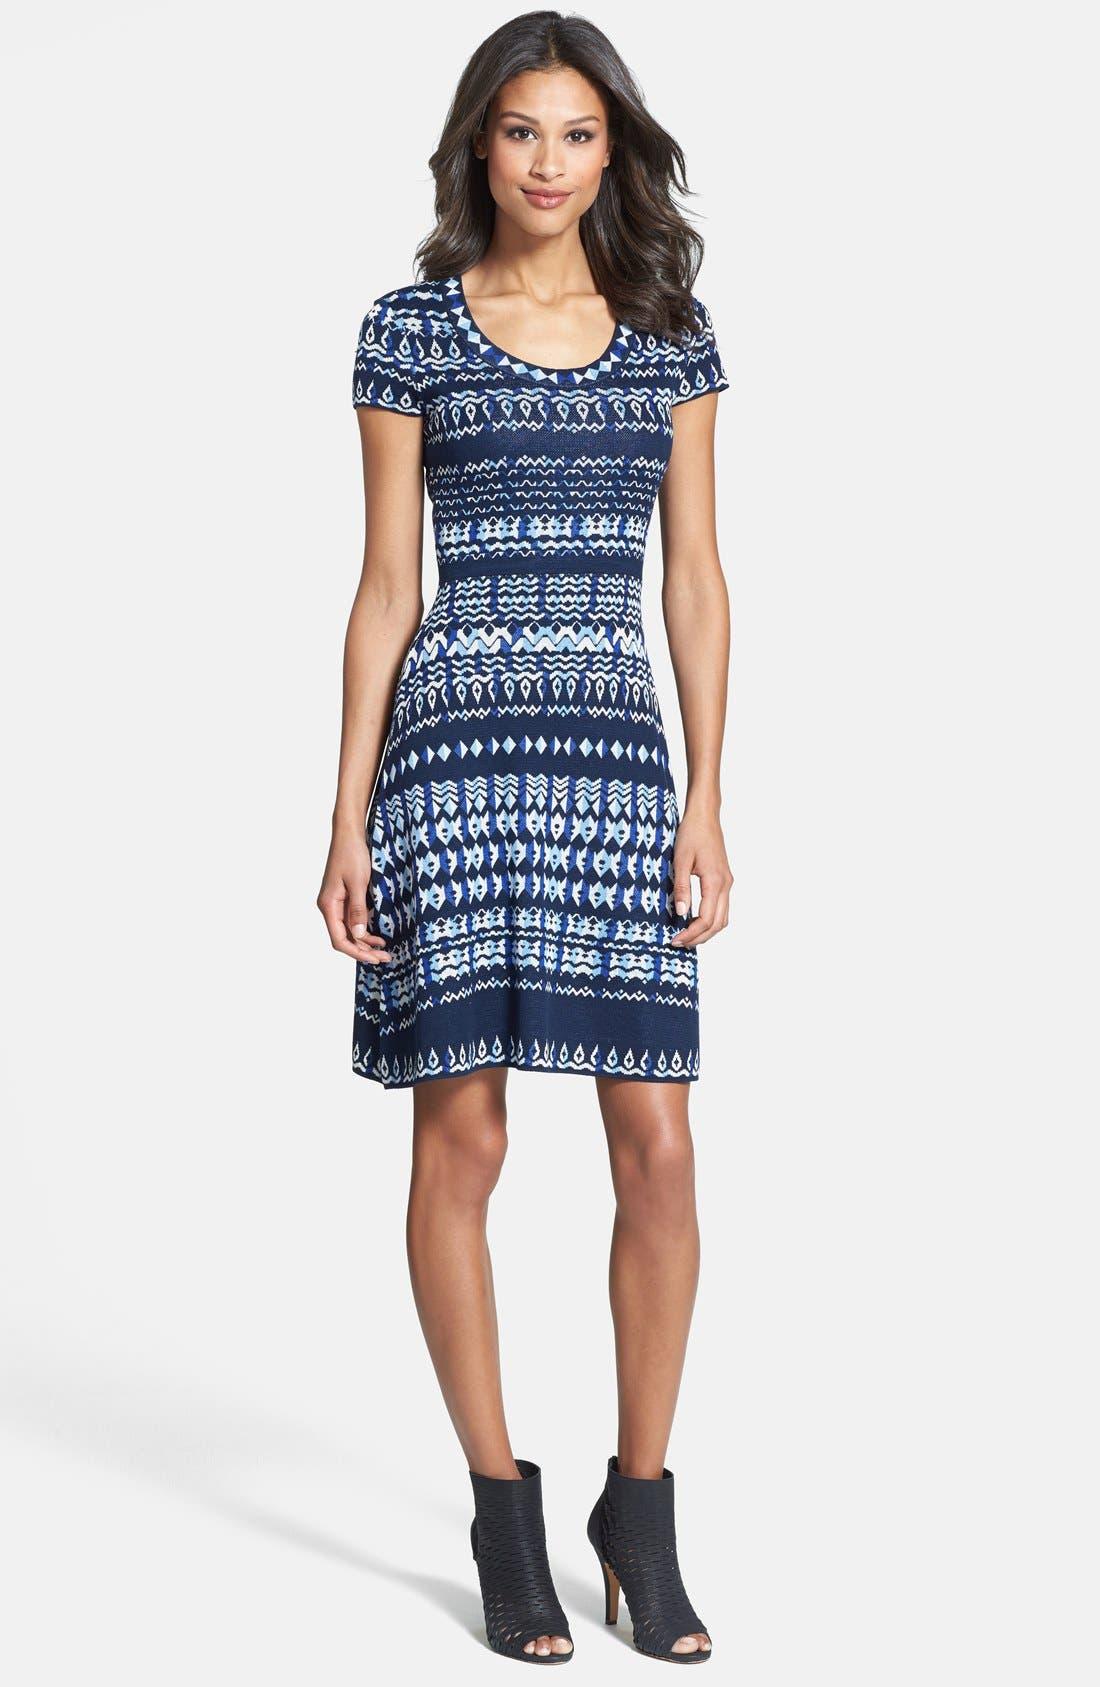 Main Image - BCBGMAXAZRIA Cap Sleeve Intarsia Knit Sweater Dress (Regular & Petite)